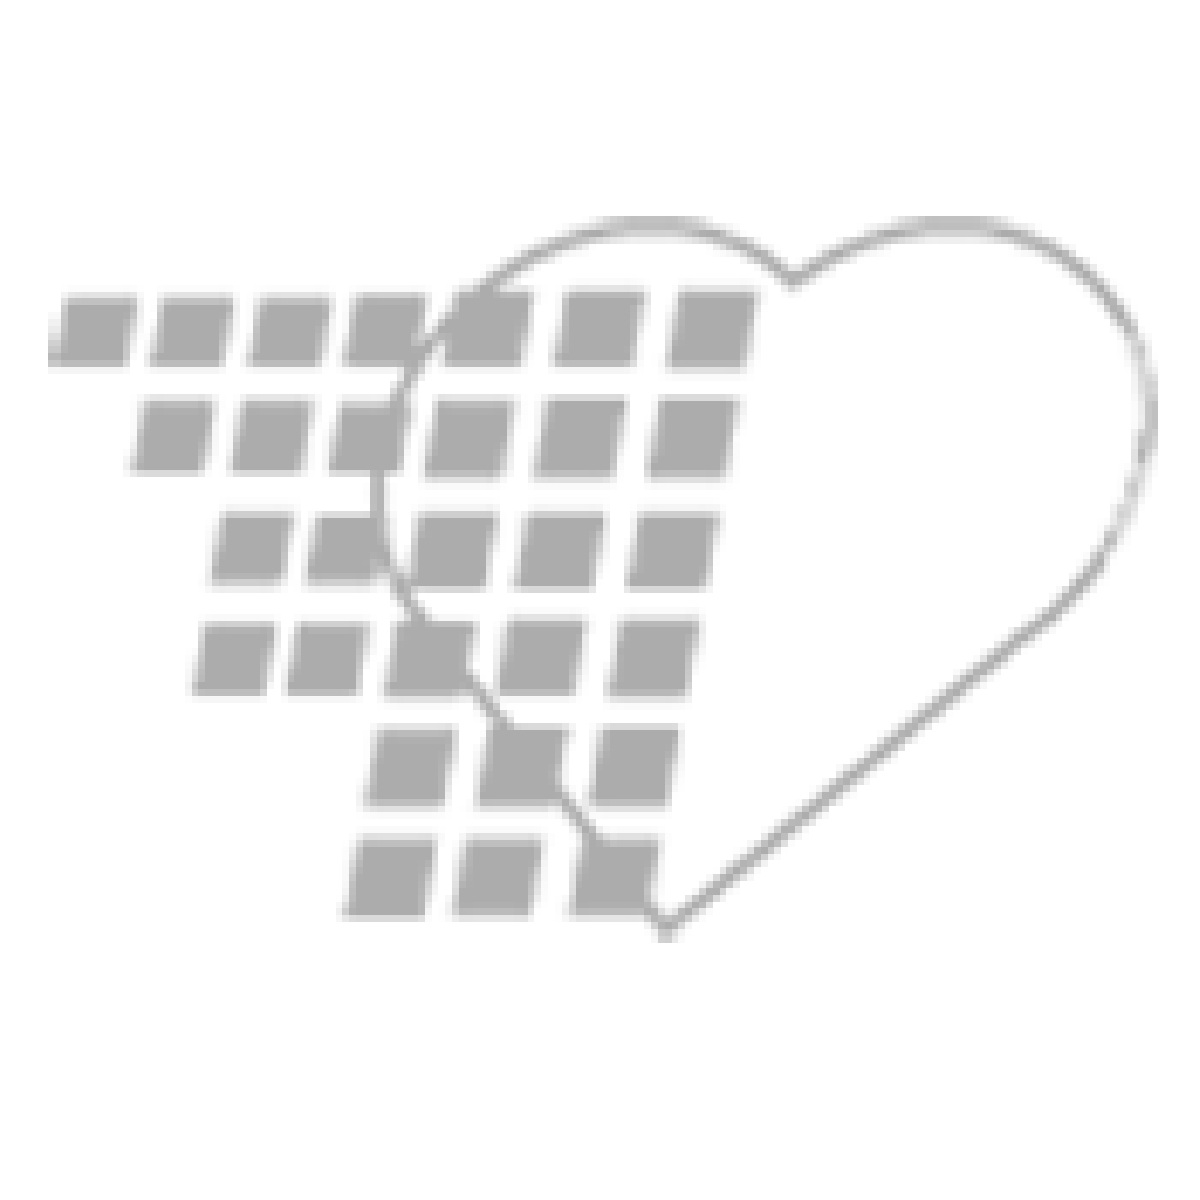 06-93-1422 Demo Dose® Vitamn K 1mg/0.5mL Ampule 1mL